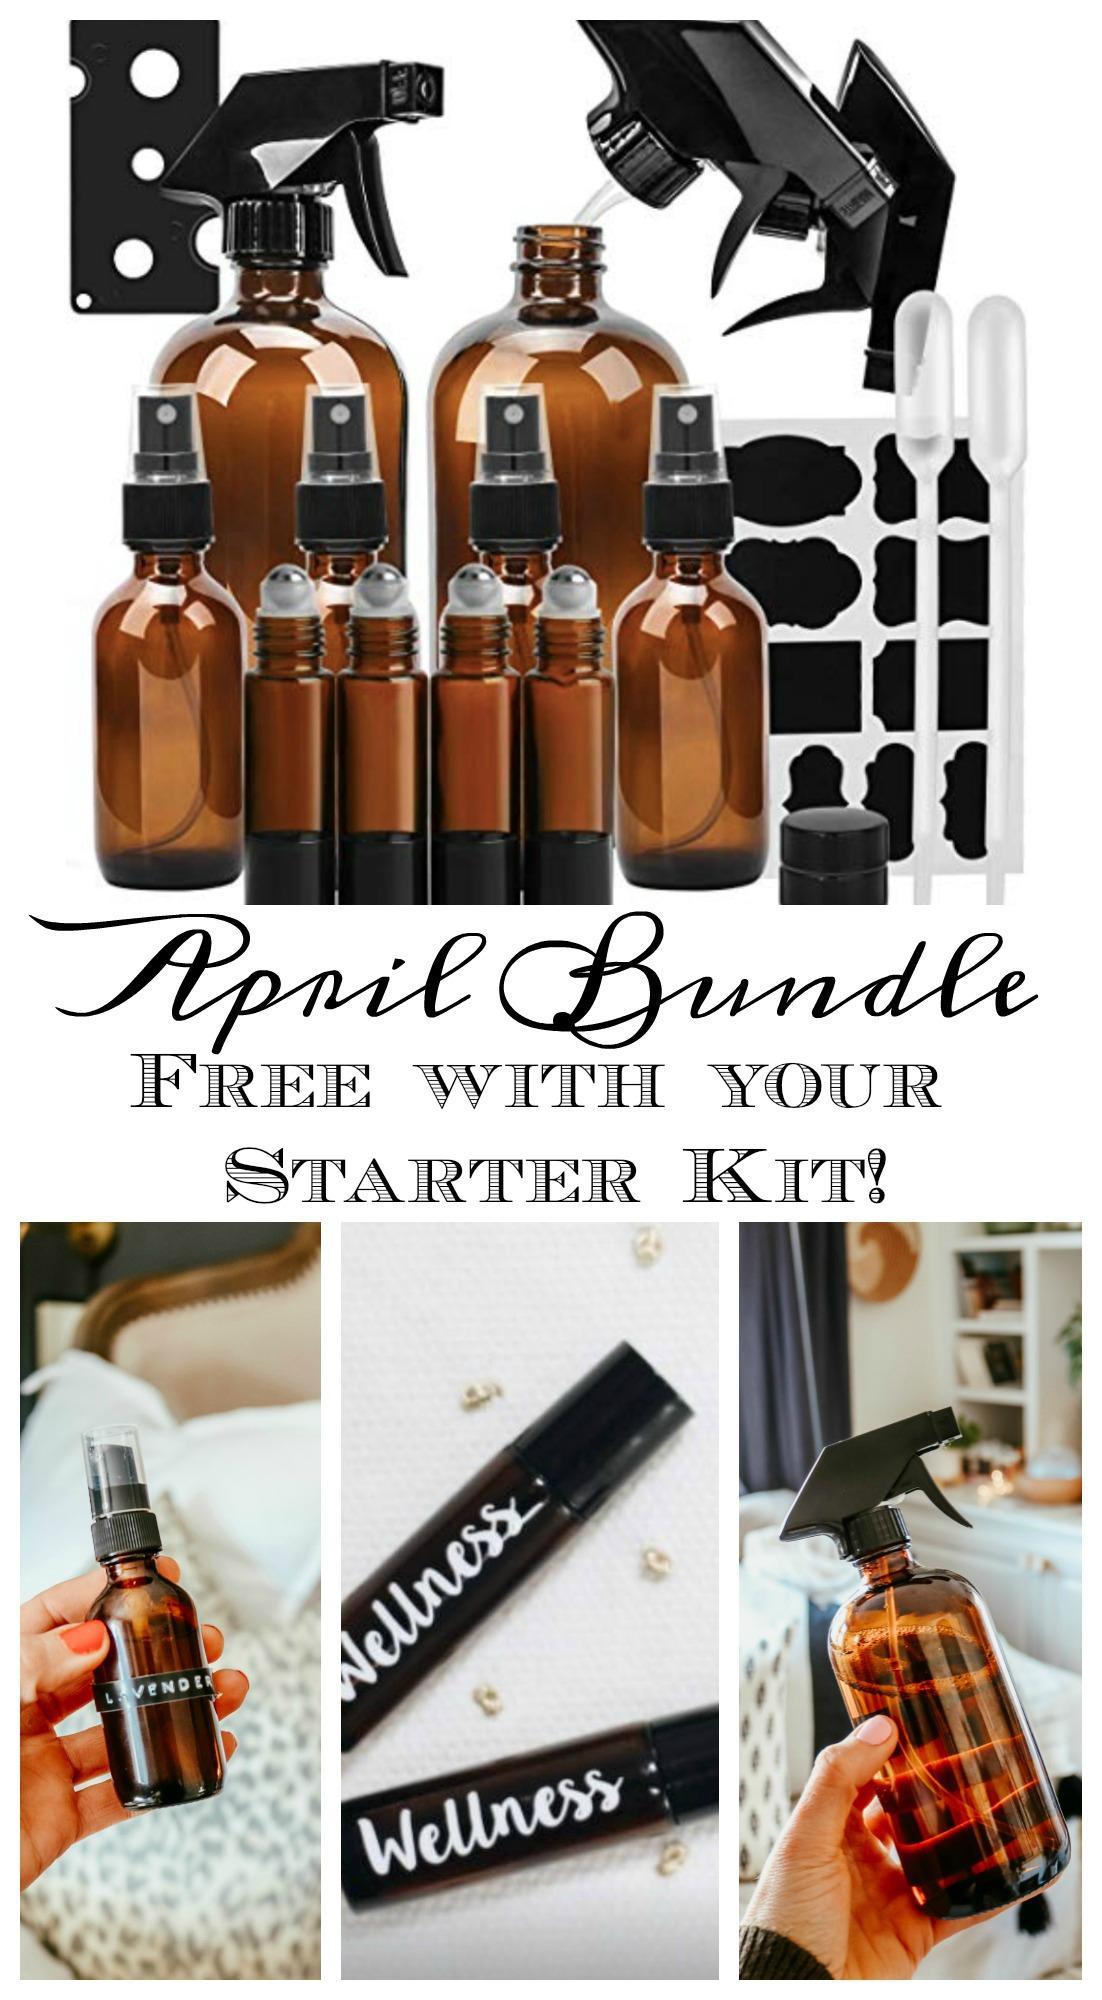 Free with Starter Kit